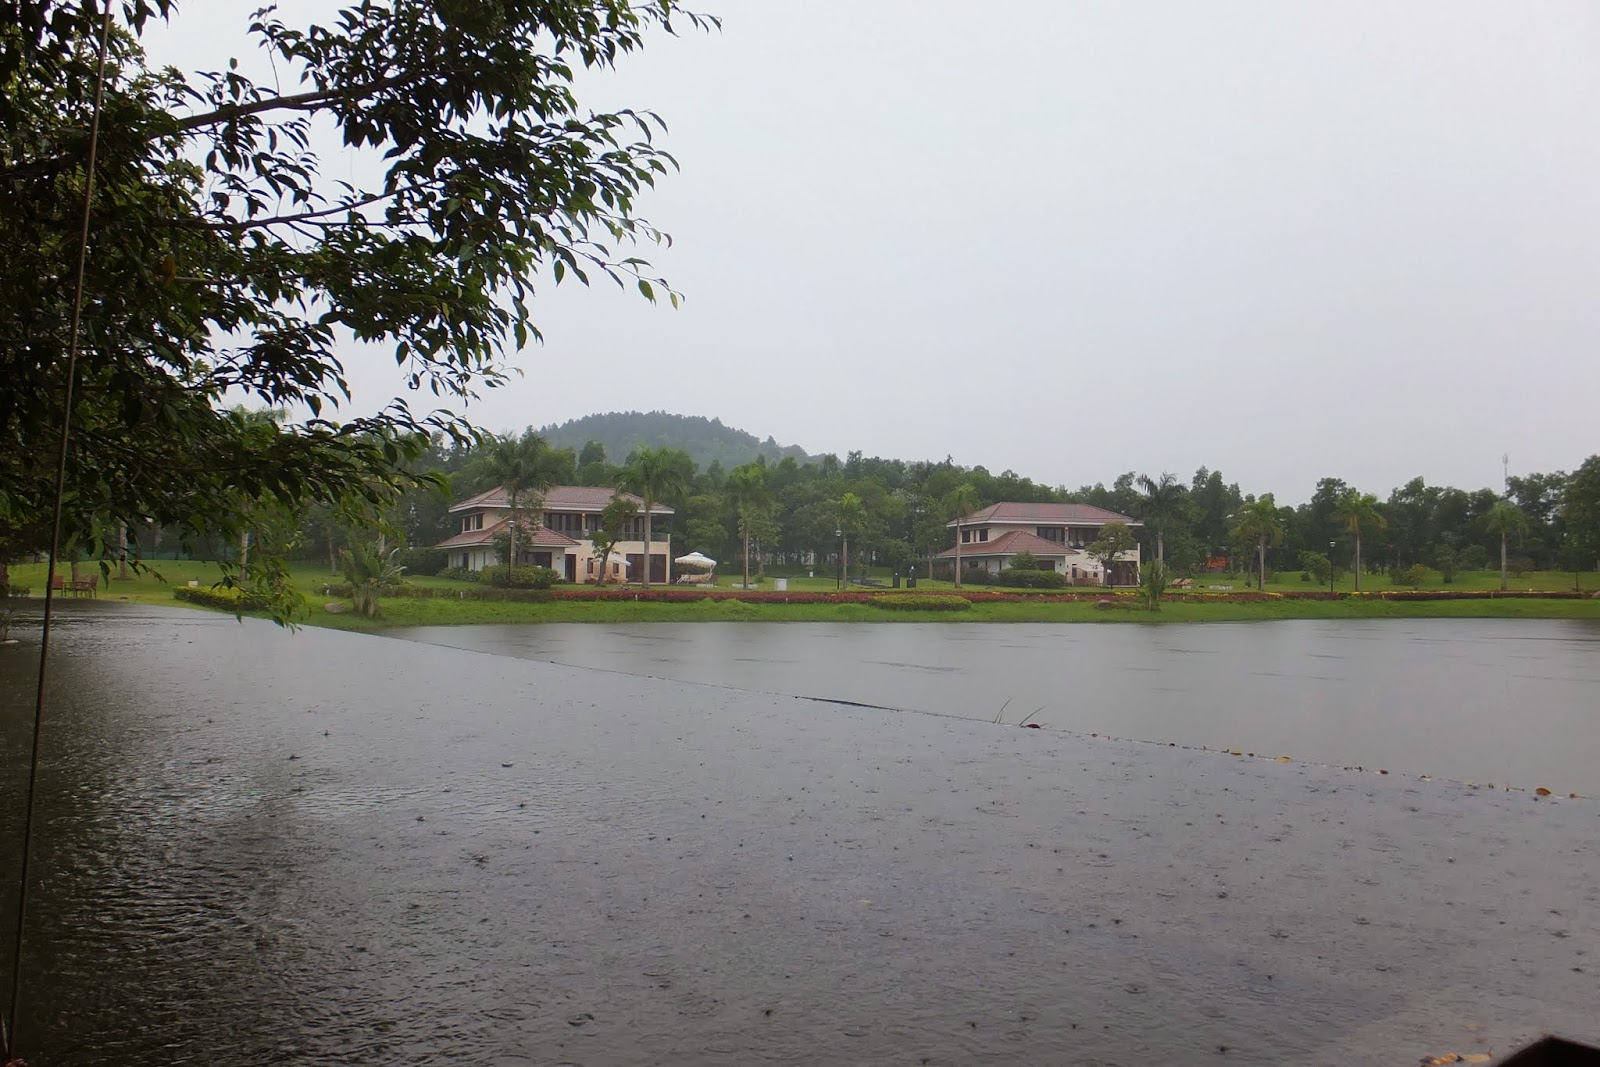 flamingo-dai-lai-resort ダイライリゾート宿泊施設